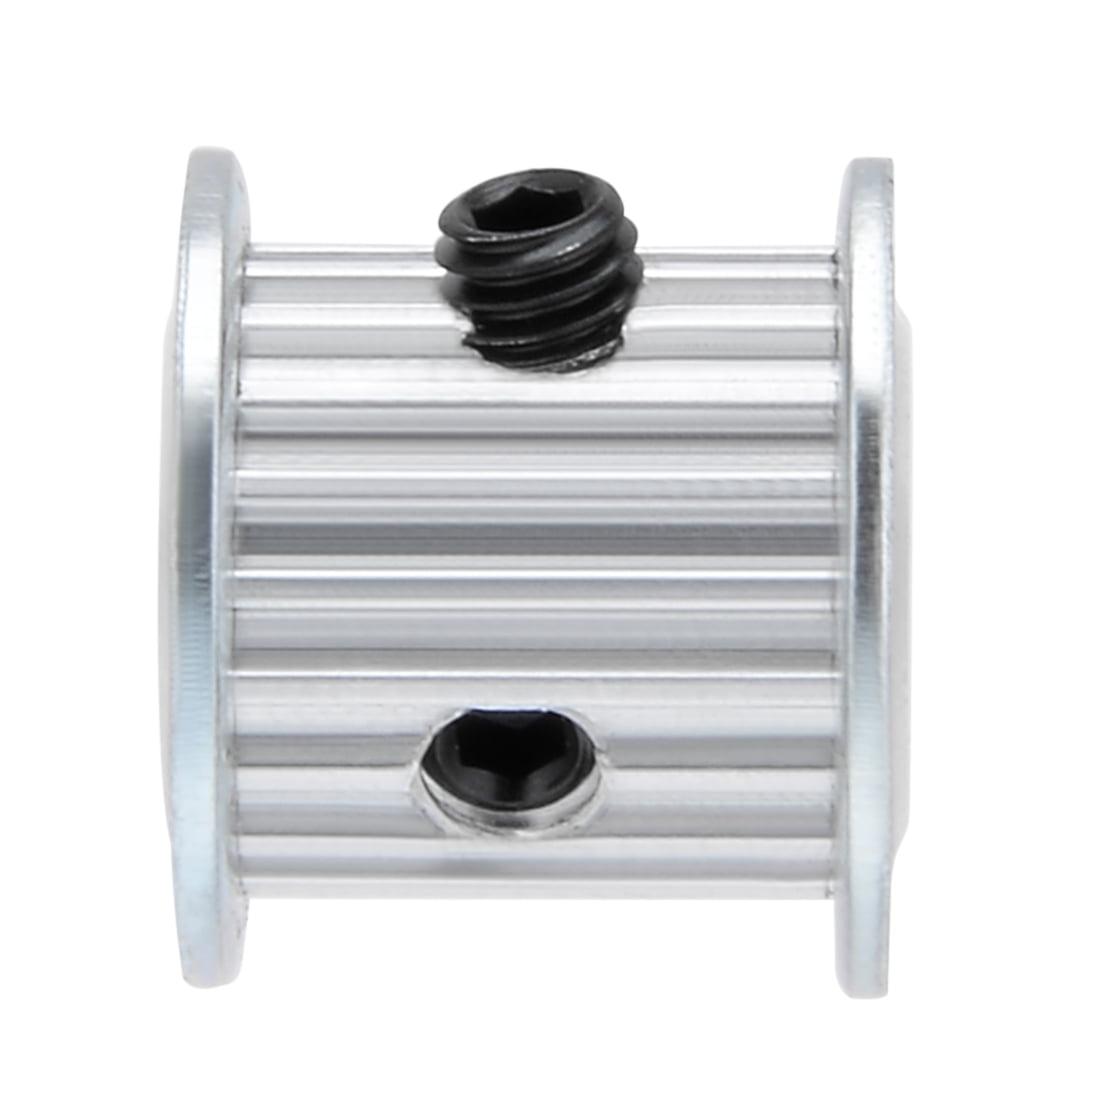 Aluminum MXL 20 Teeth 5mmx4.5mm D-Shape Bore 11mm Belt Timing Idler Pulley Wheel - image 5 of 6